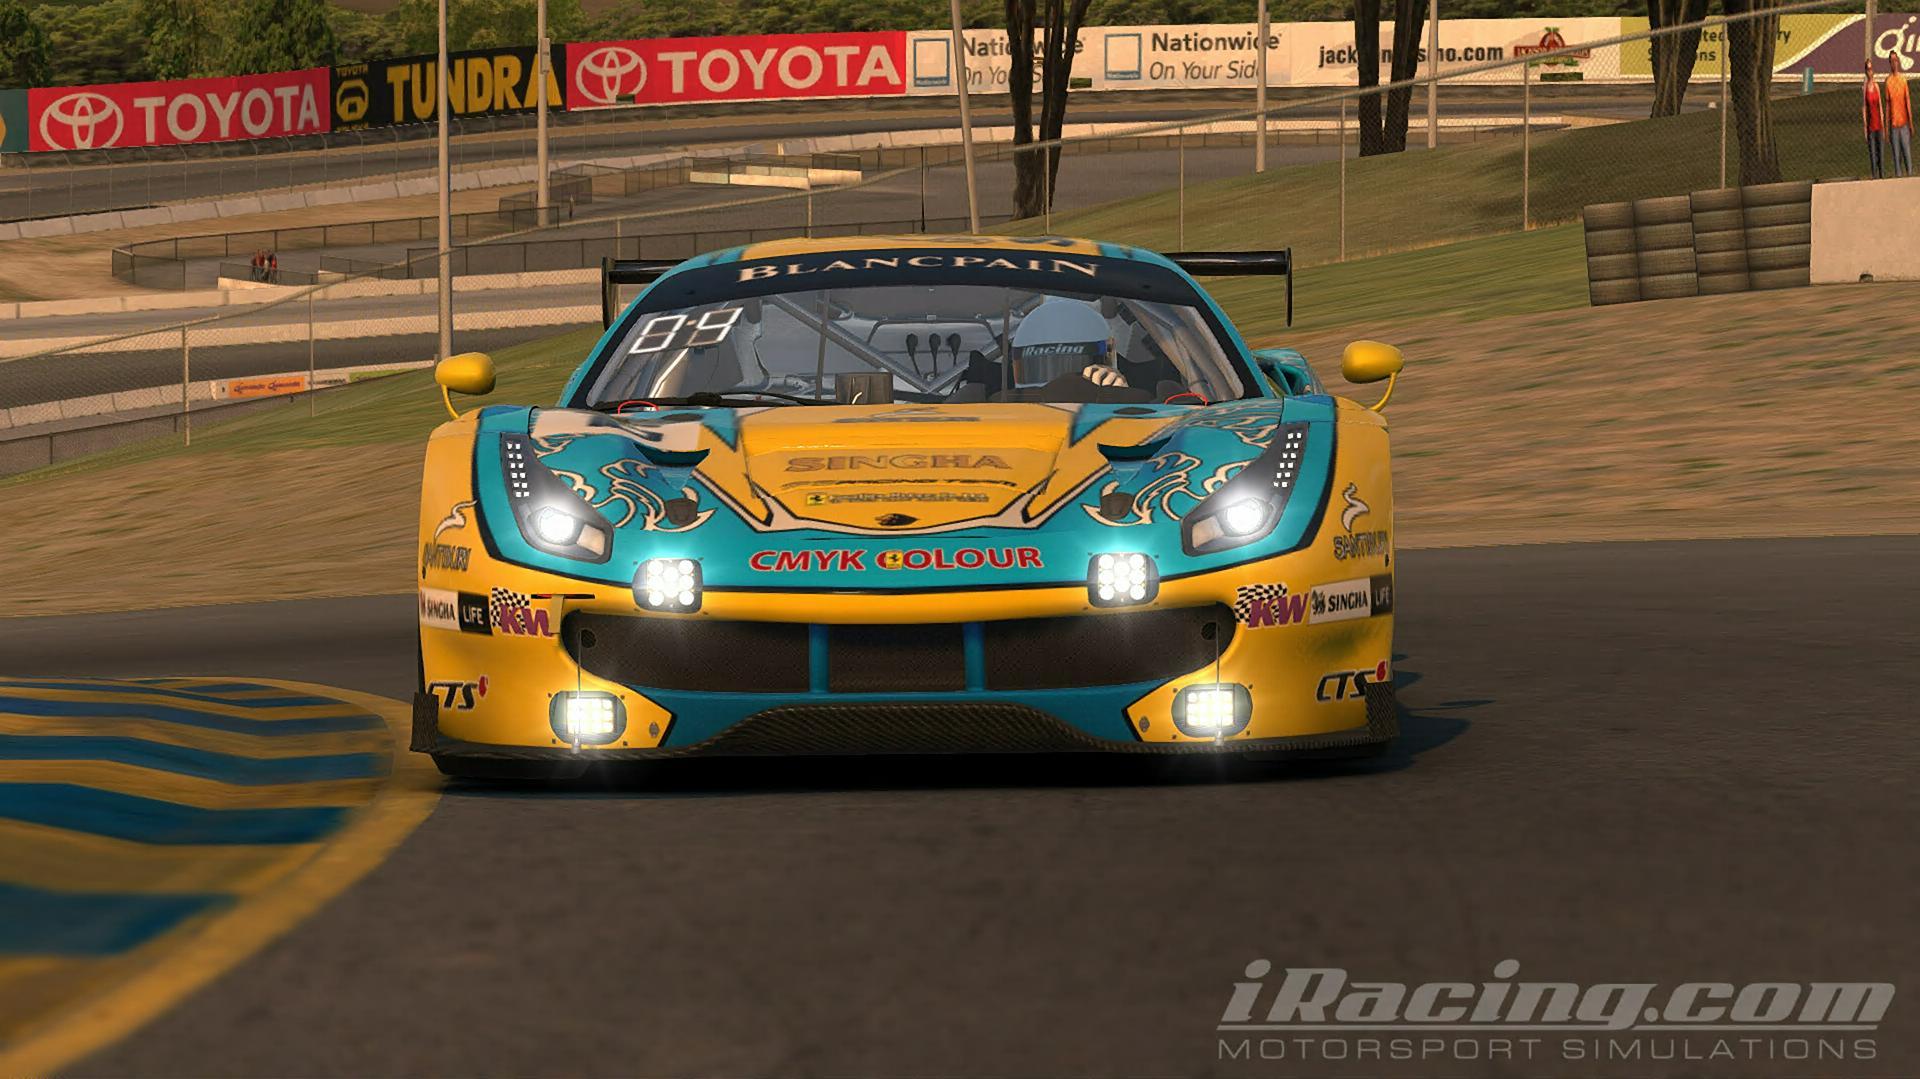 Preview of Singha Motorsports Ferrari 488 GT3 by Mathew Epstein